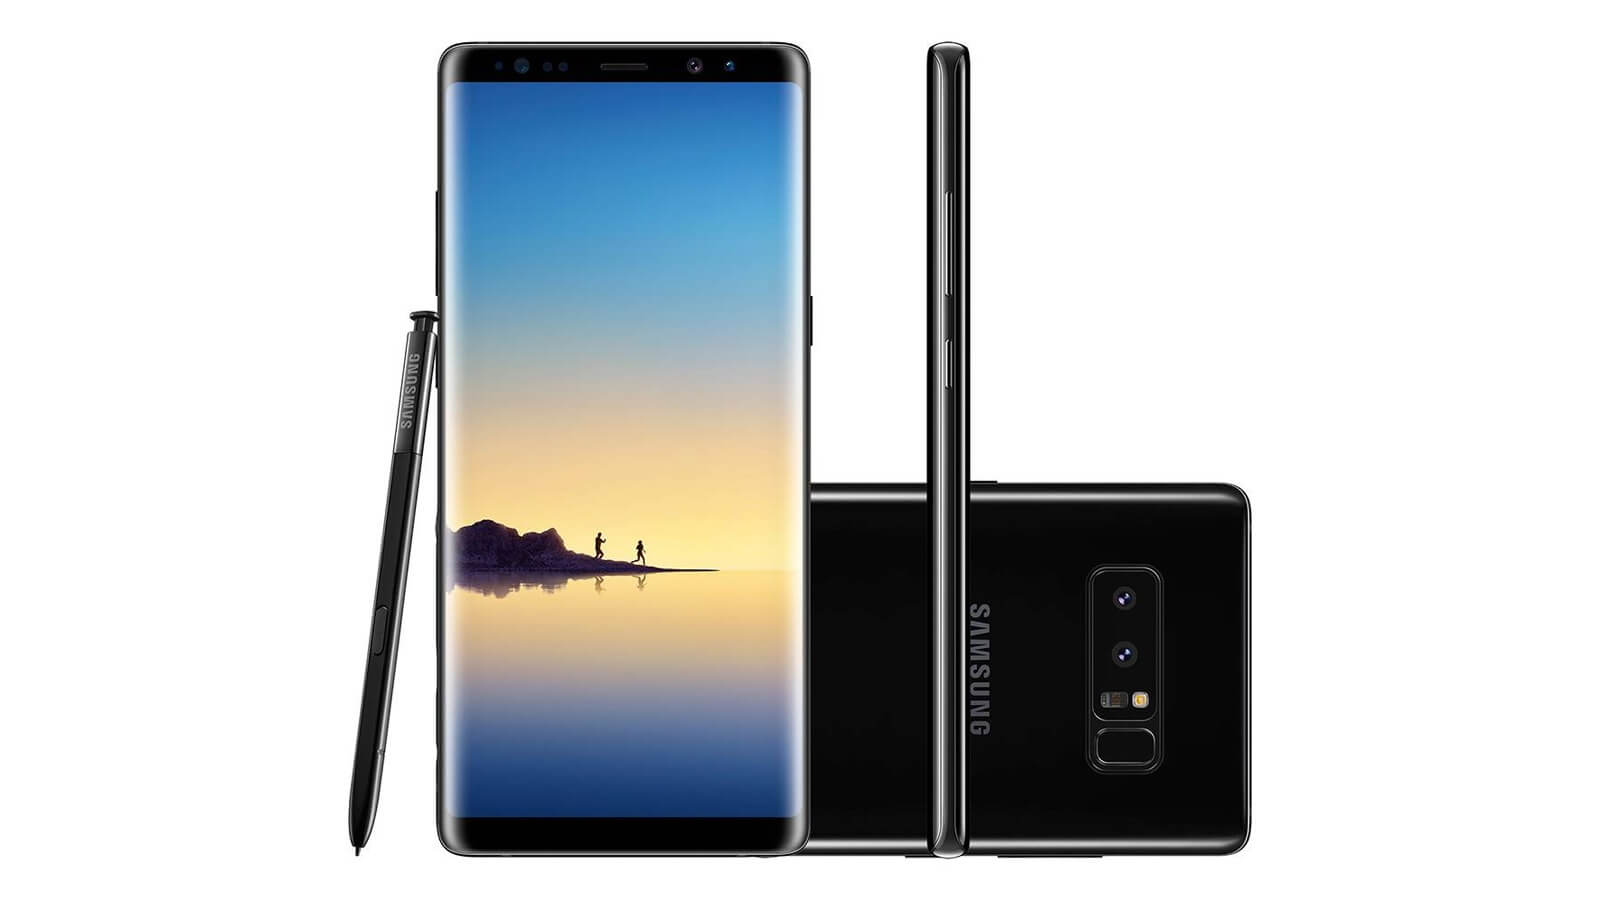 Samsung galaxy note 8 - smartphones top de linha